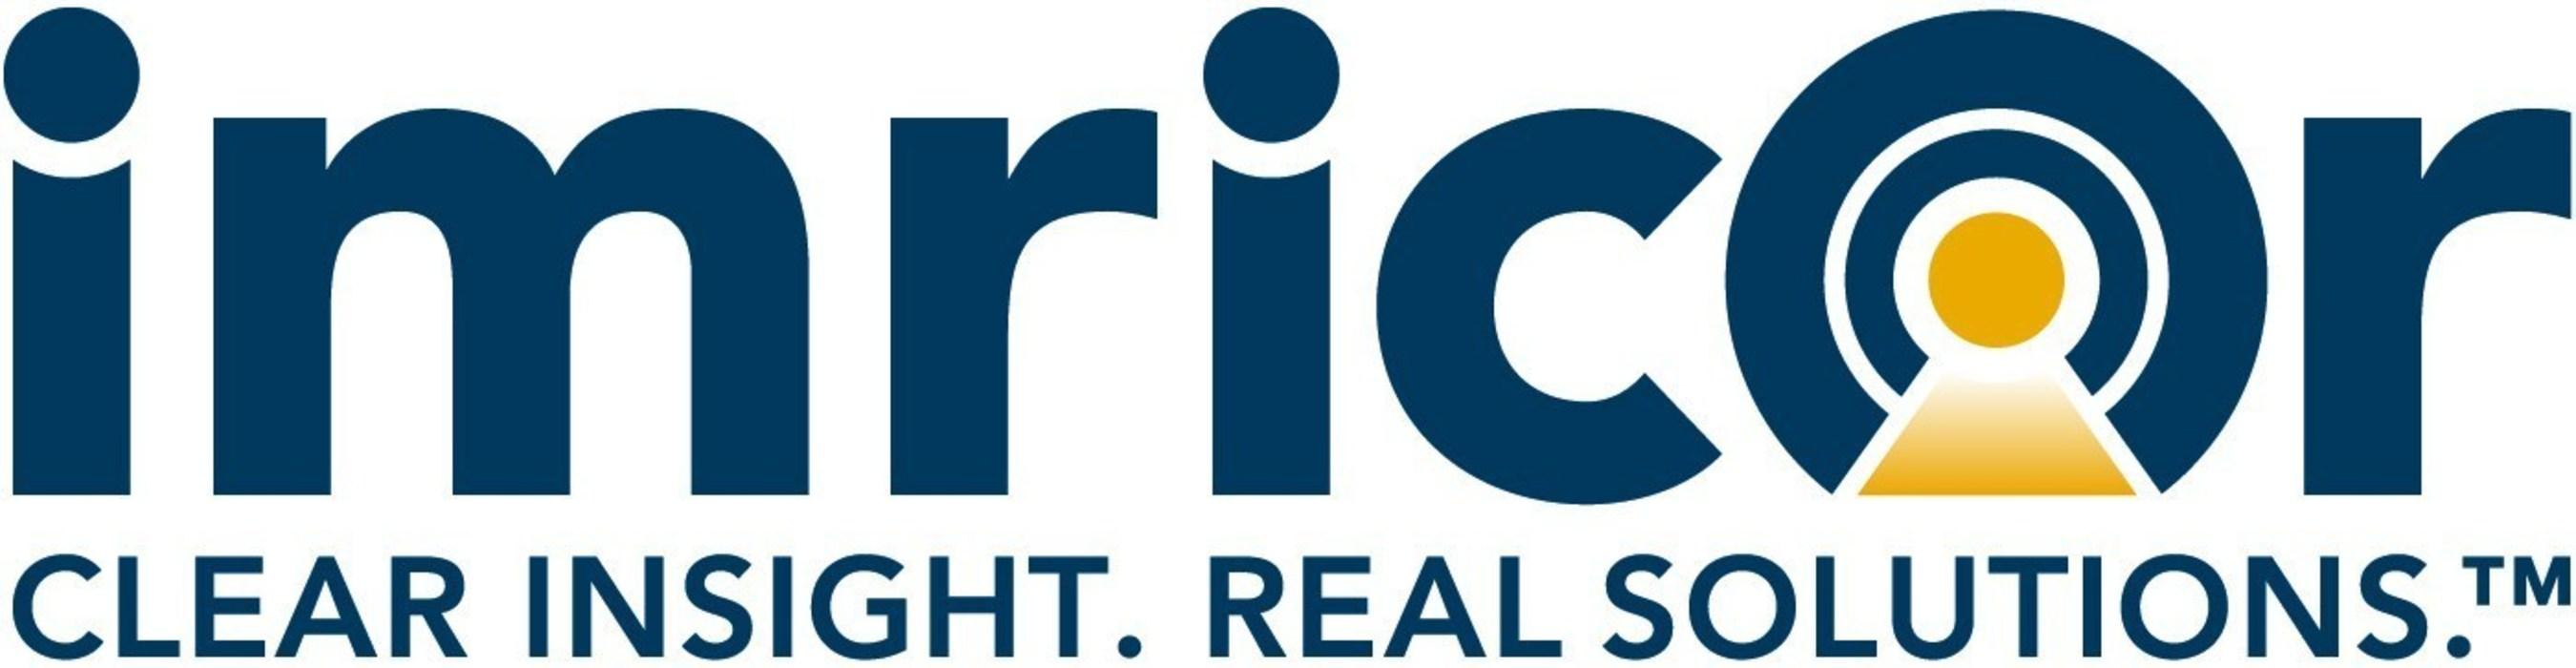 Imricor Medical Systems, Inc.